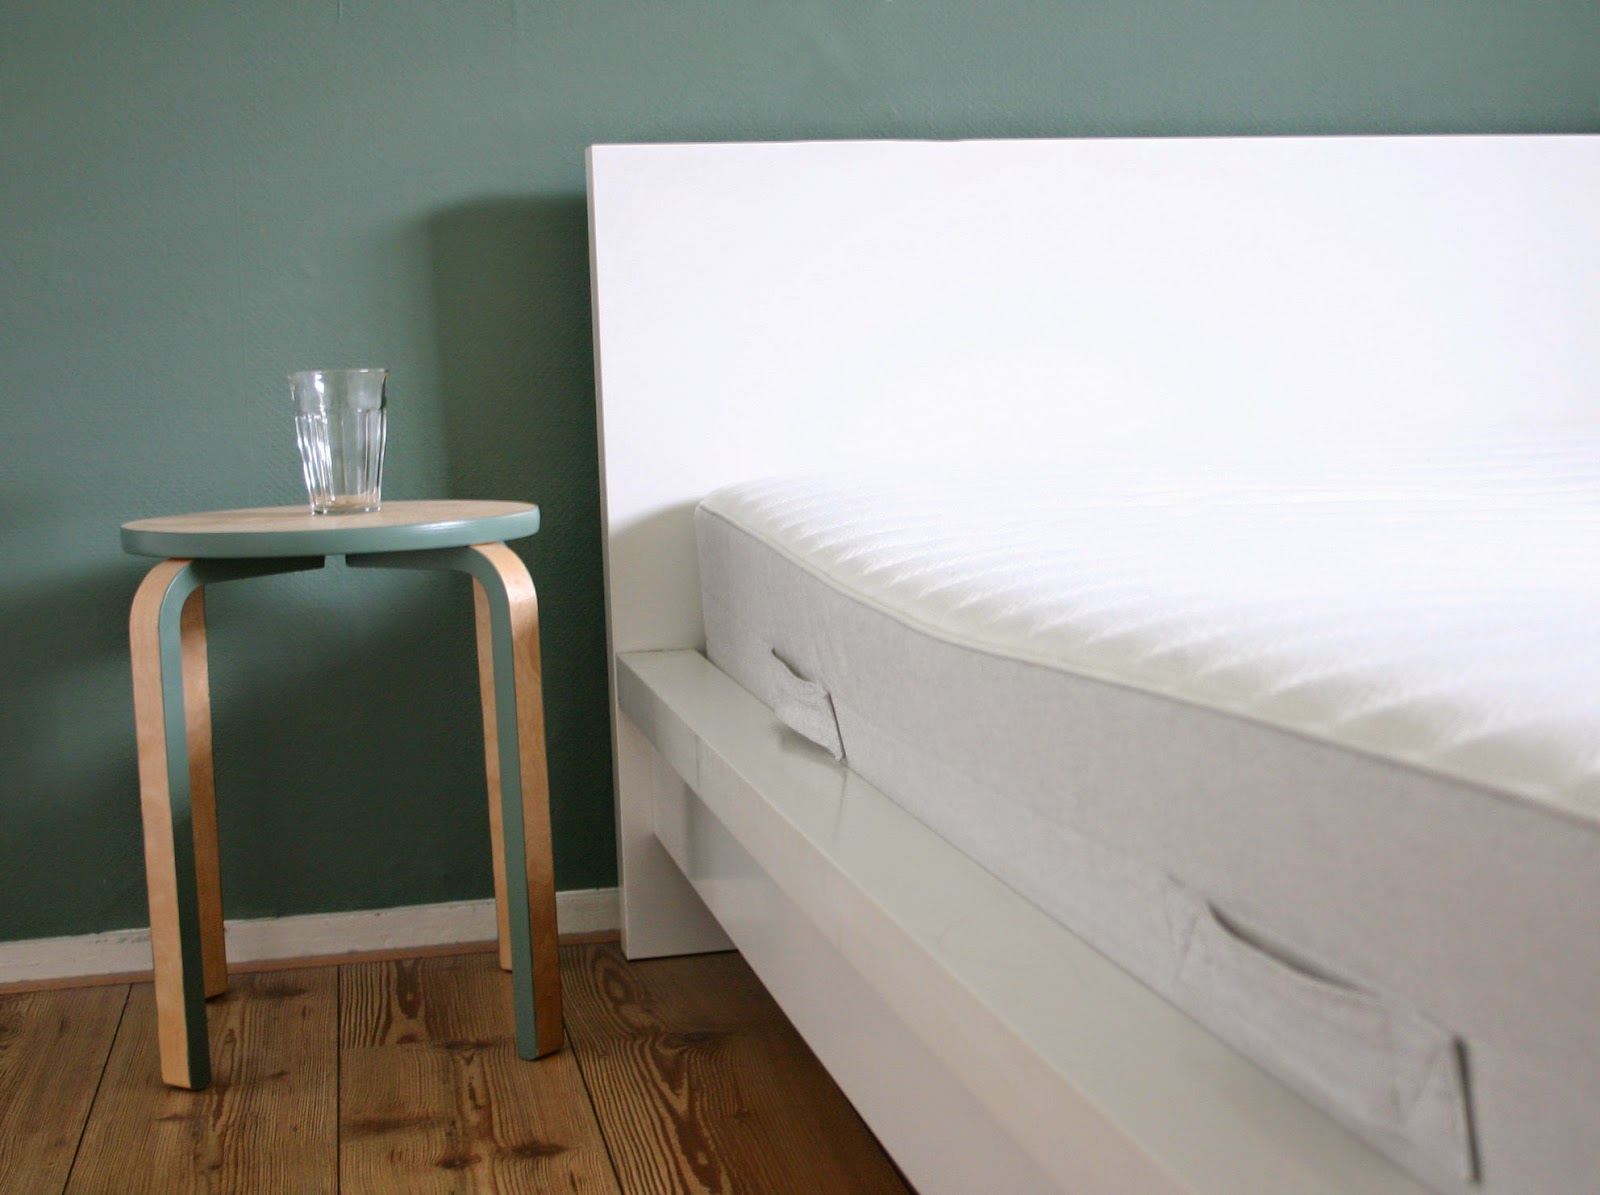 Fotos Slaapkamer Restylen : Pica t slaapkamer restylen